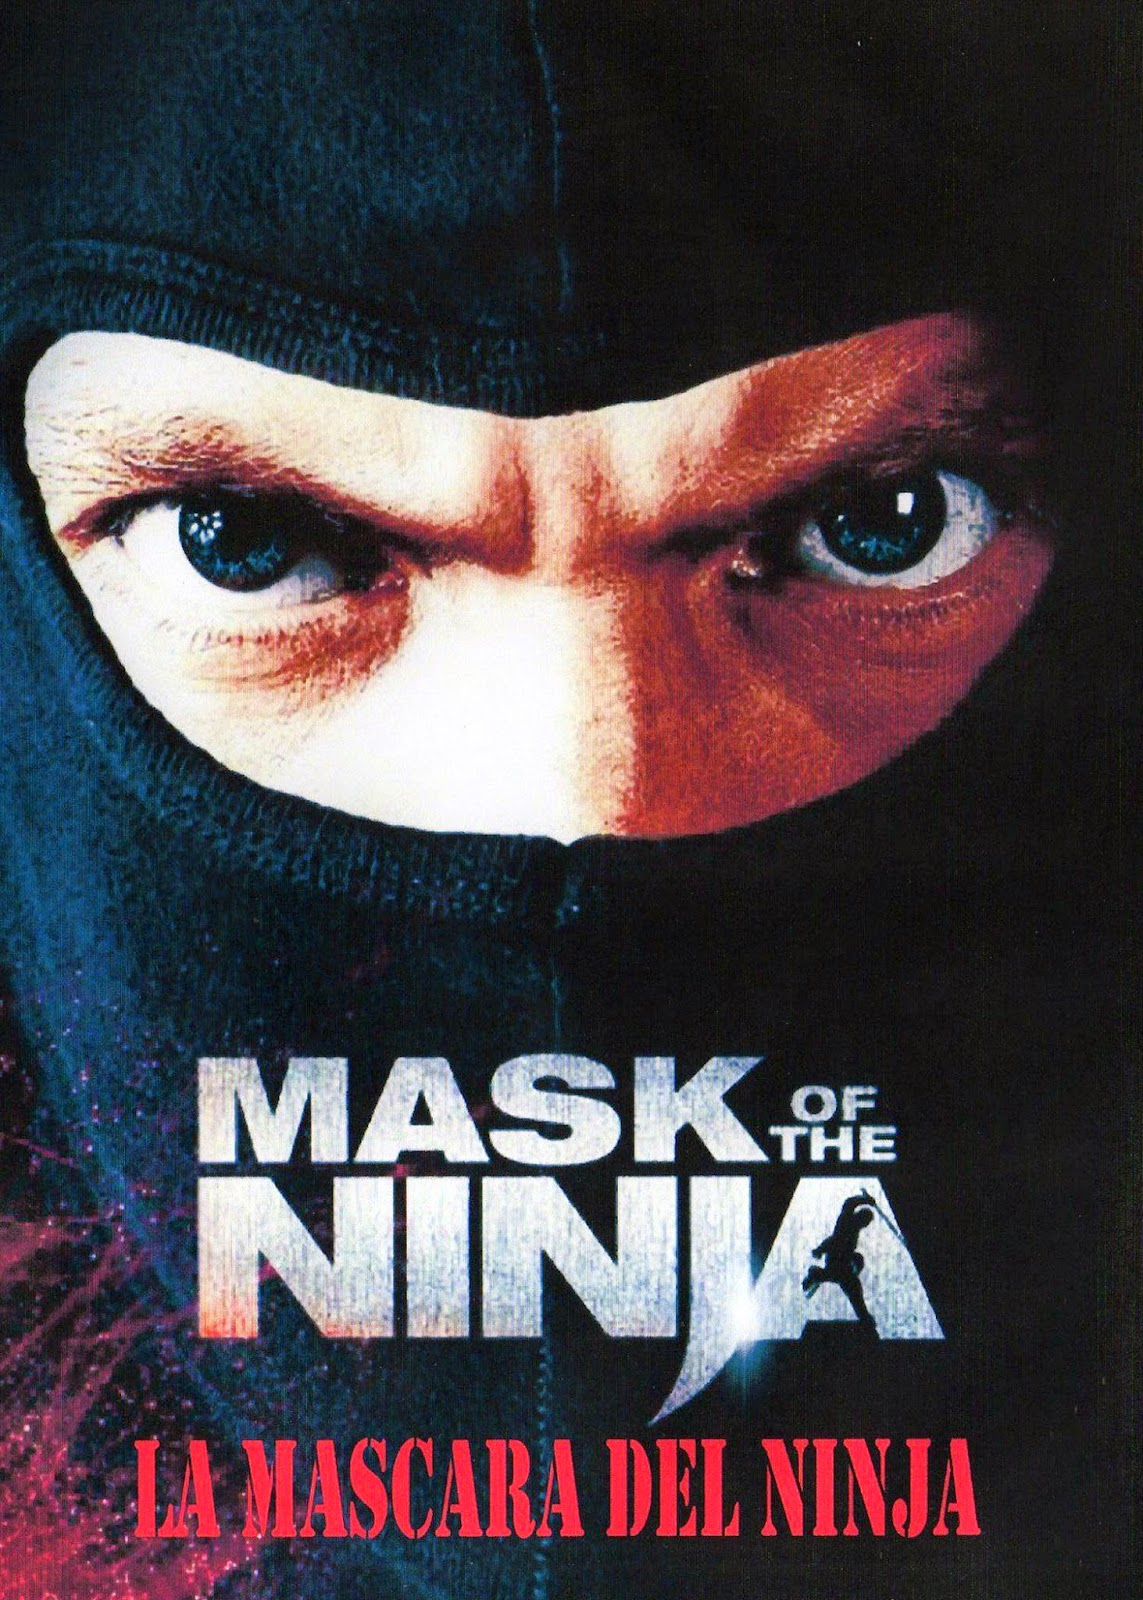 La mascara del ninja (2008)